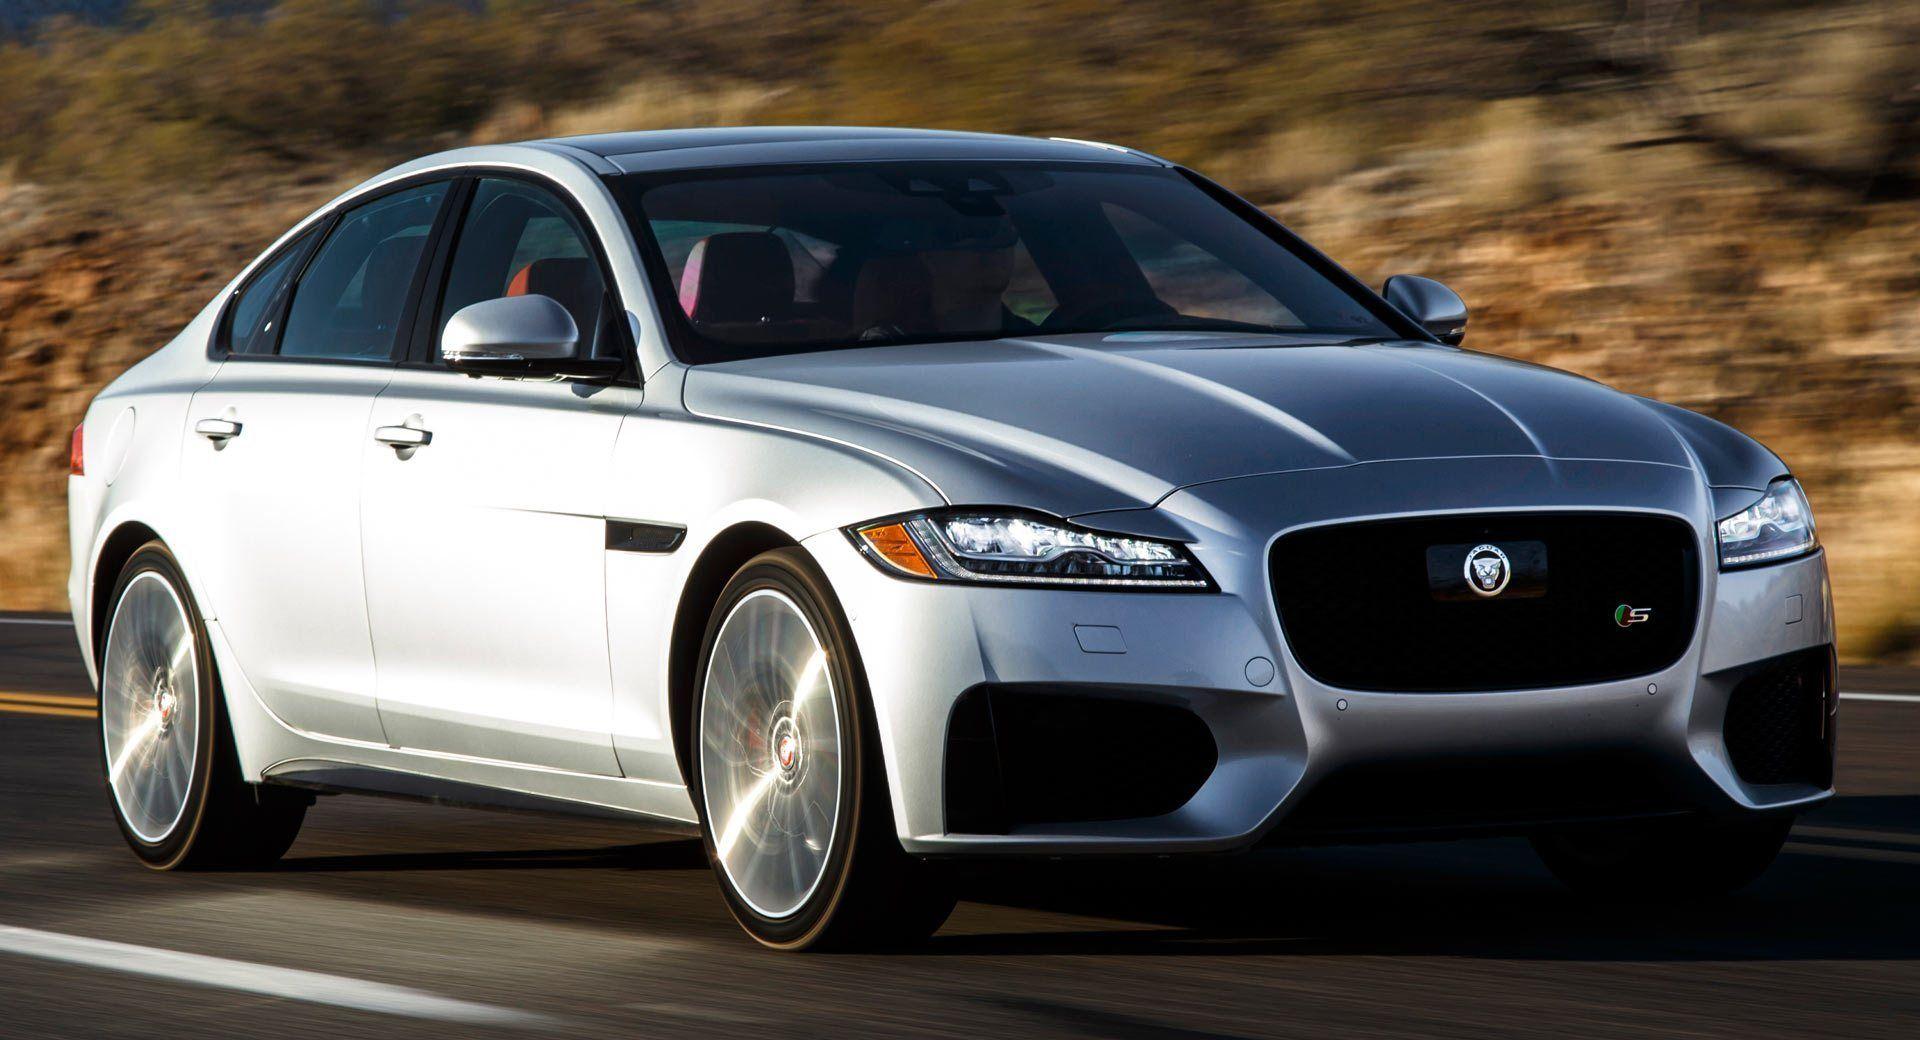 2021 Jaguar Xj Price And Release Date Jaguar Xf Jaguar Xe Jaguar Car